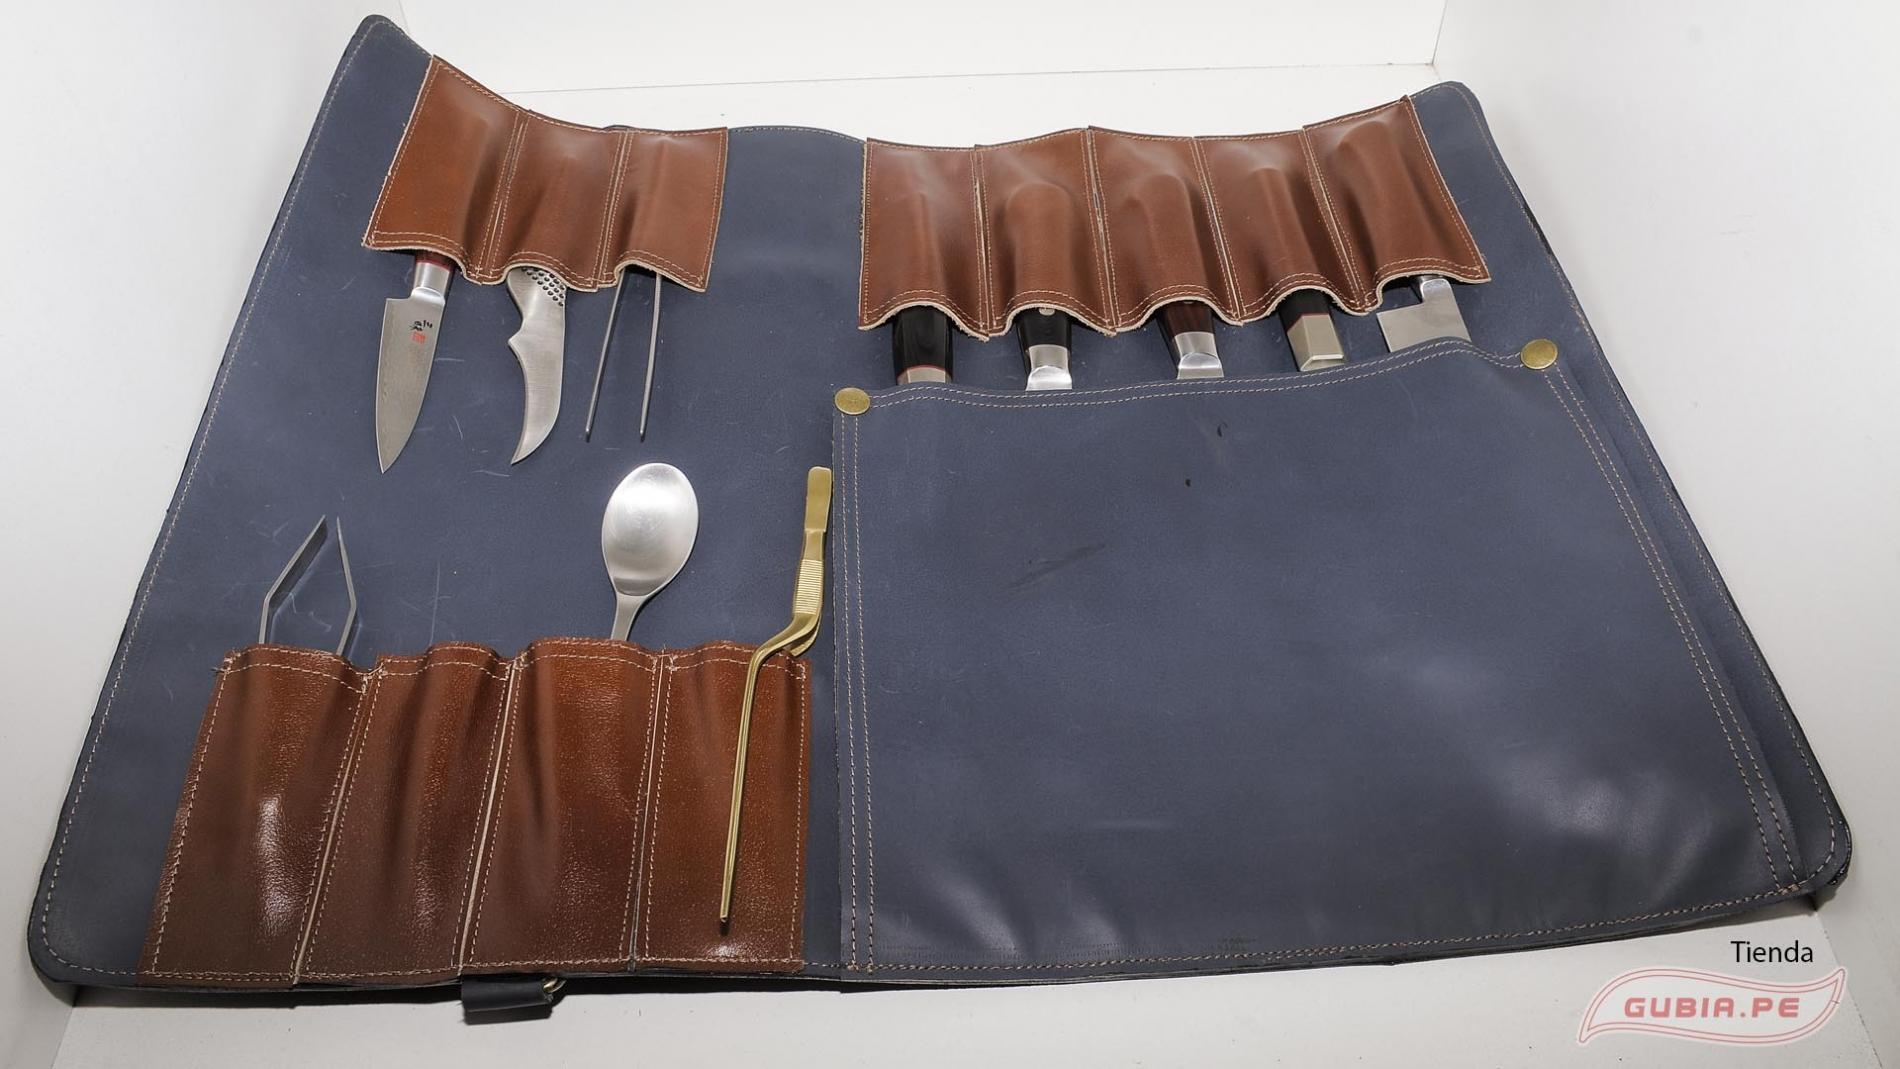 GUB0080-Maletin de cuero para cuchillos -max-2.